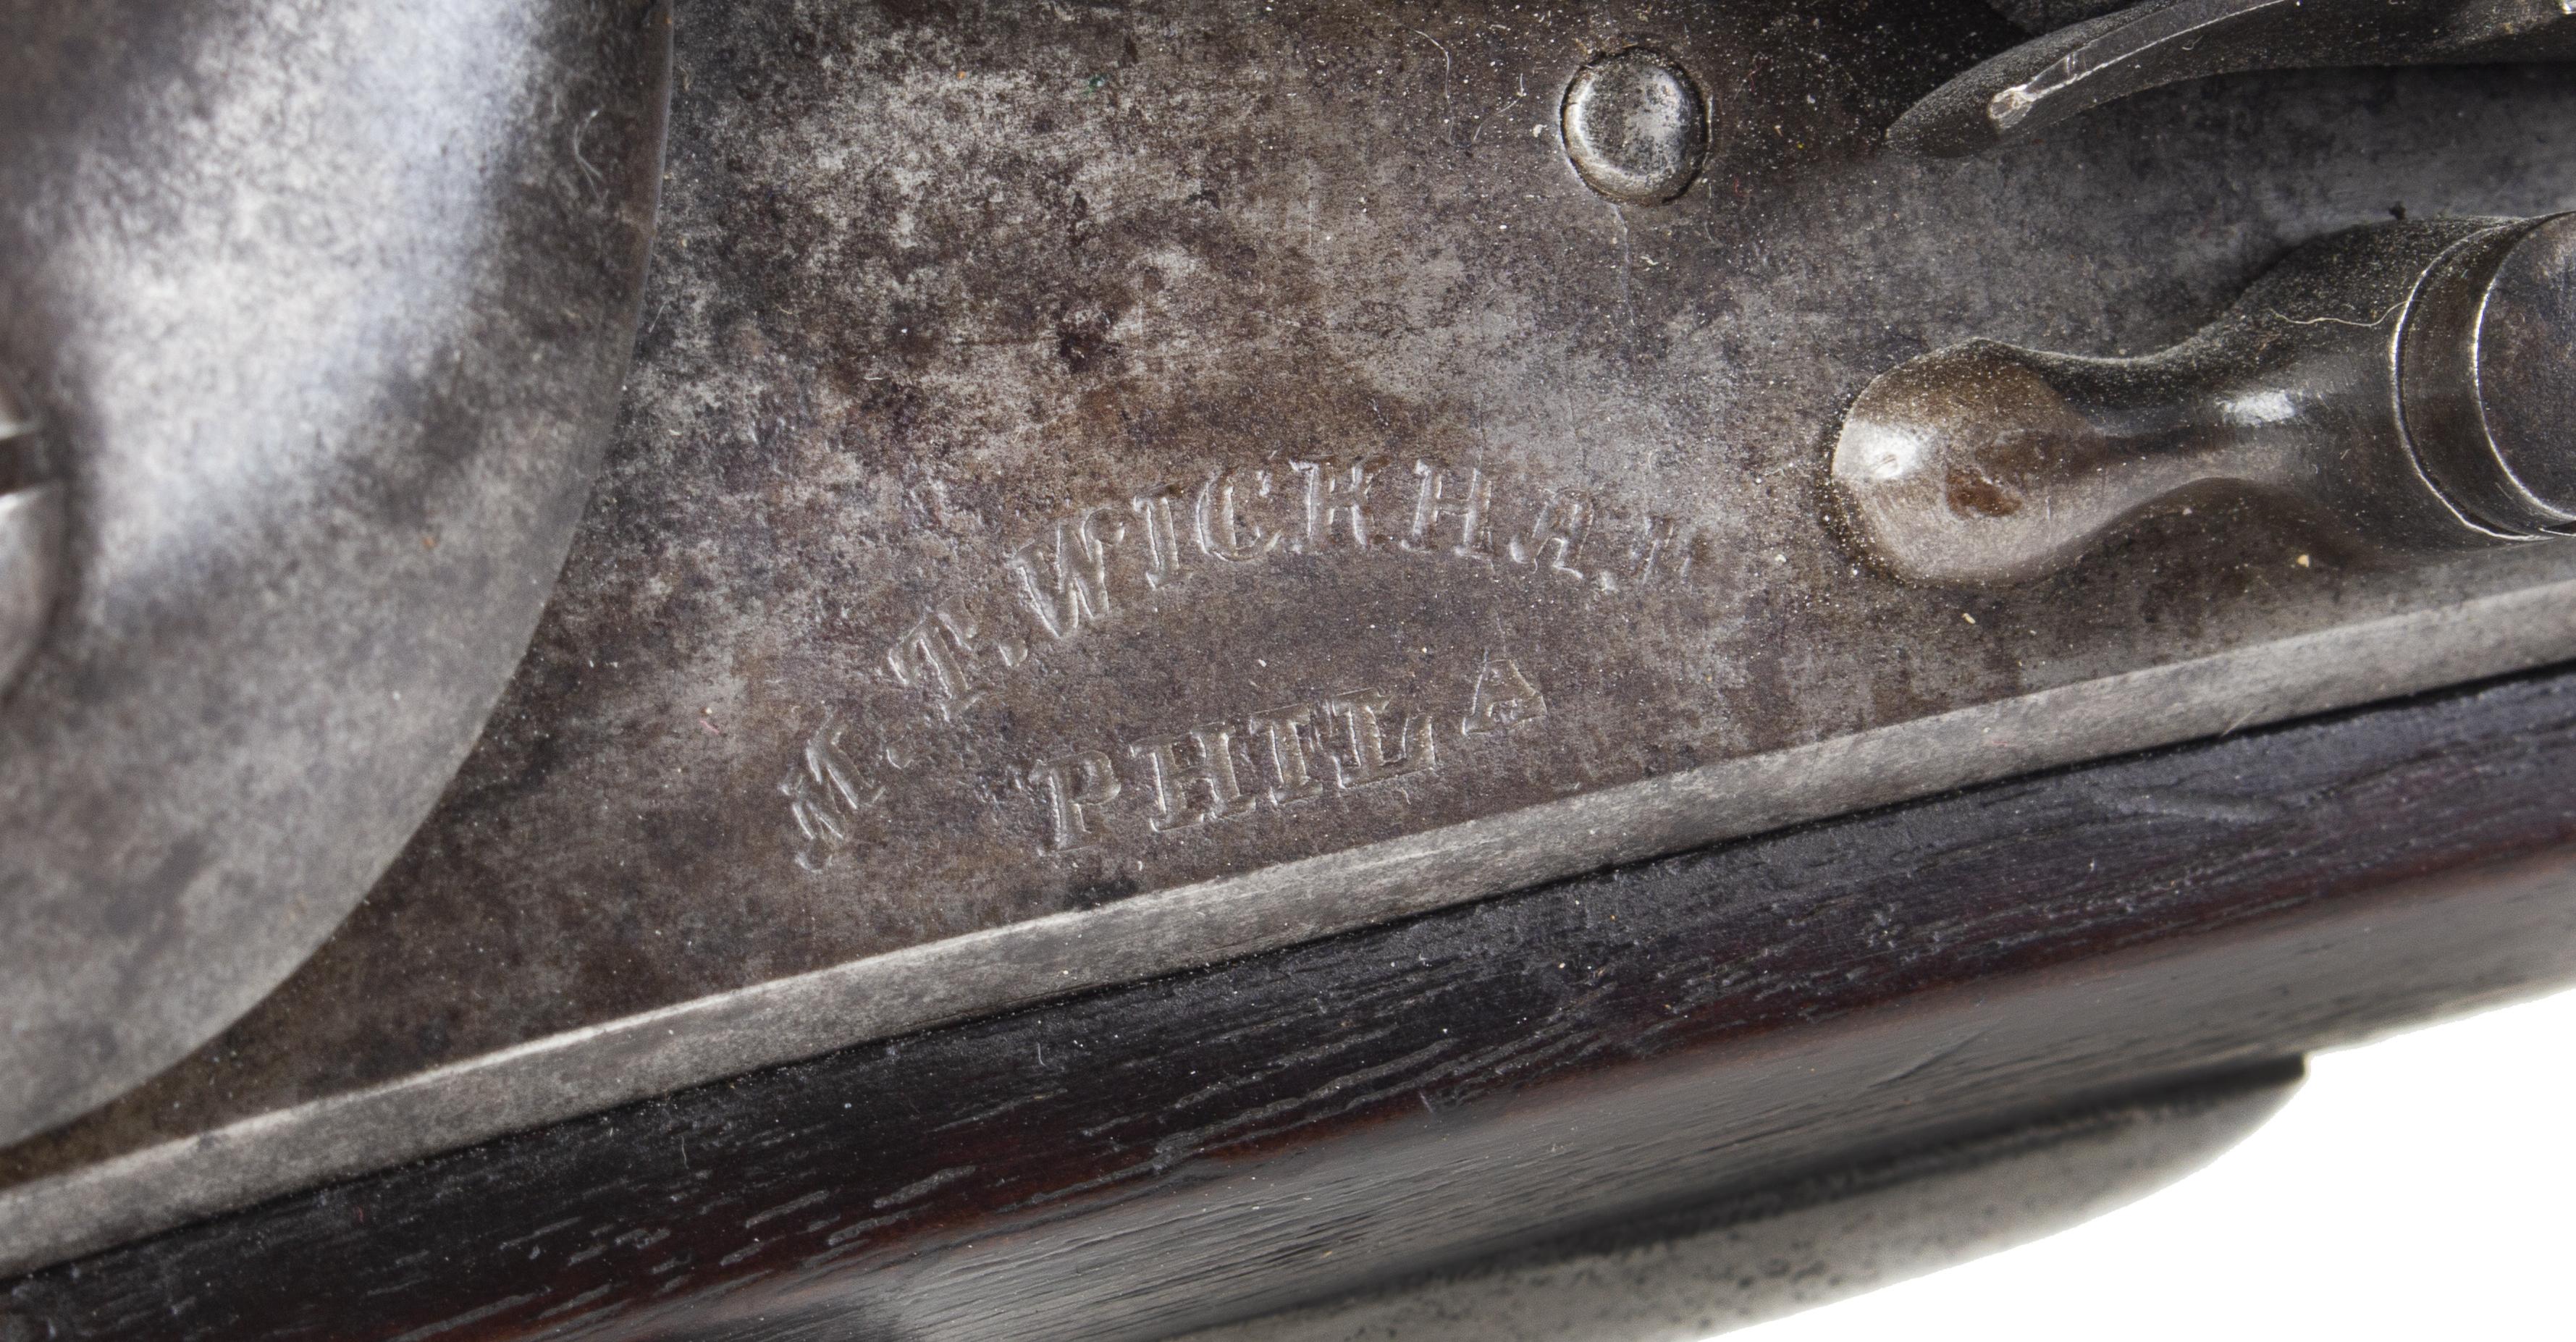 US Model 1816 Musket, Type I by M.T. Wickham of Philadelphia, & Bayonet, address